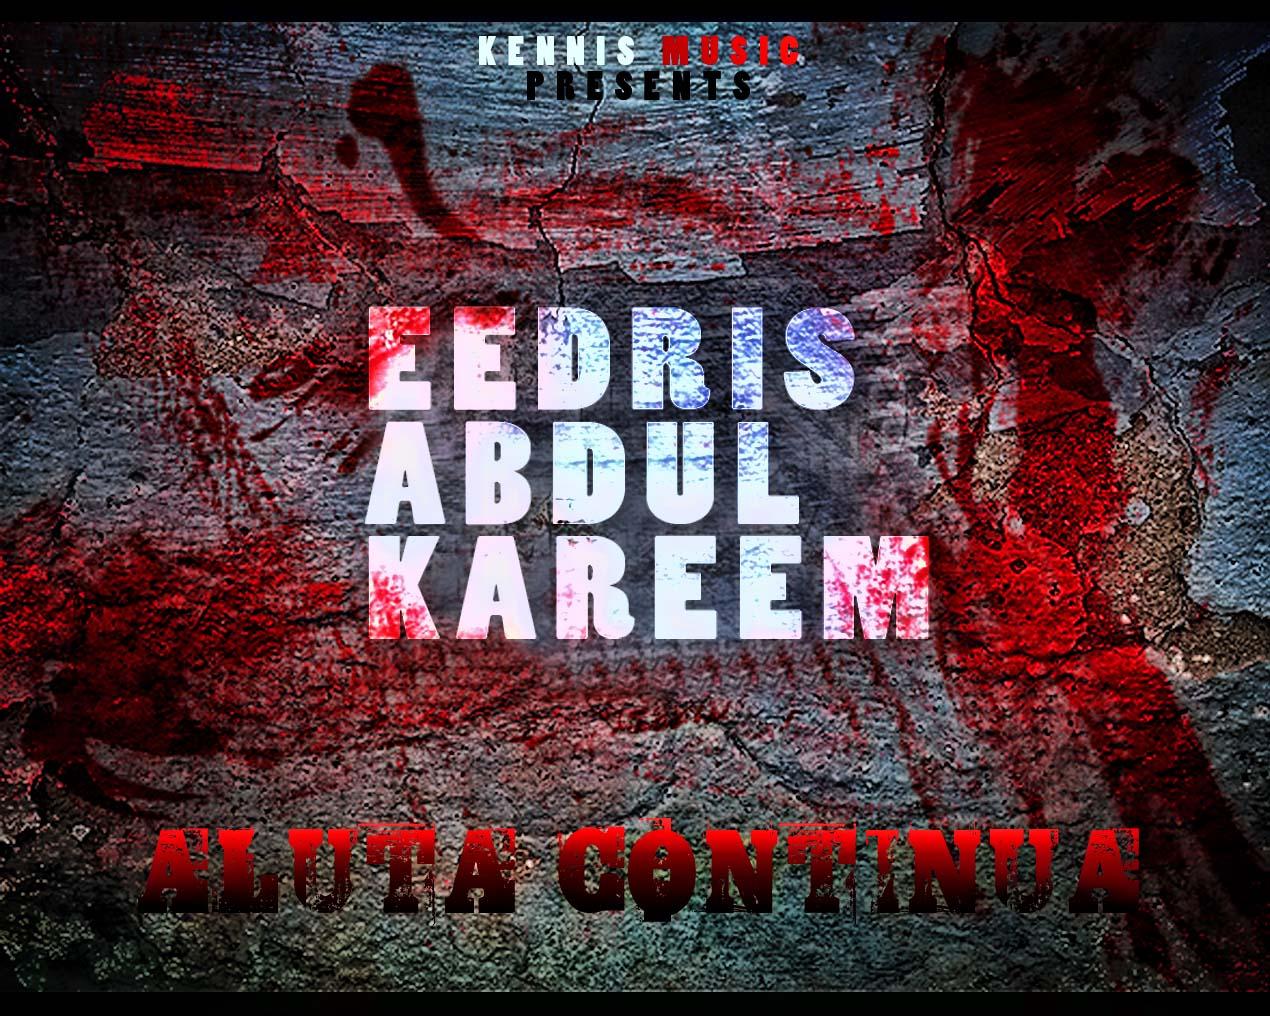 Eedris Abdulkareem - Aluta Continua